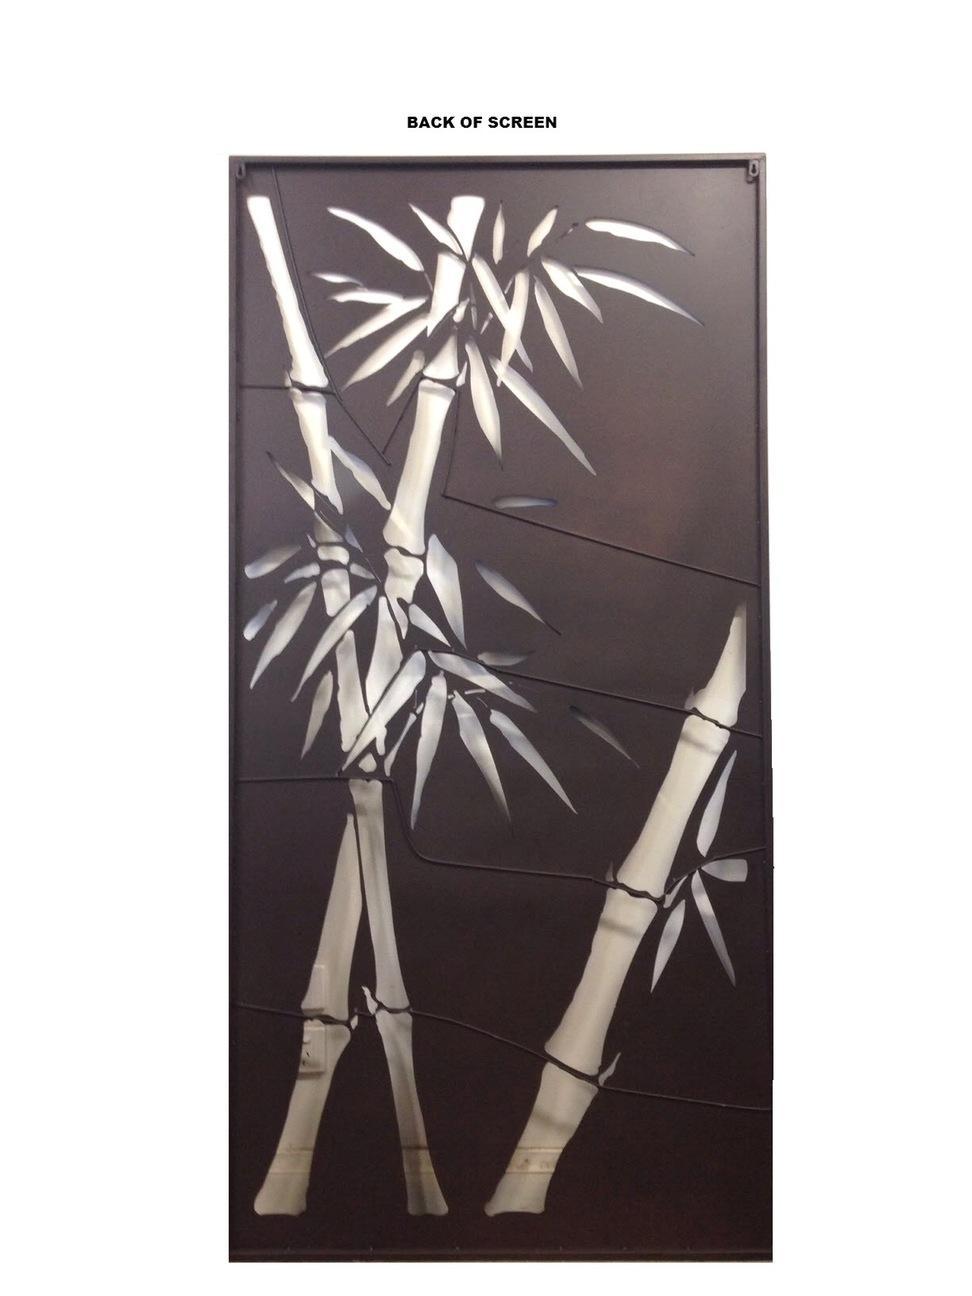 Decorative Metal Screens Wall Art Garden Bamboo Ebay ~ Loversiq Pertaining To Bamboo Metal Wall Art (View 6 of 20)